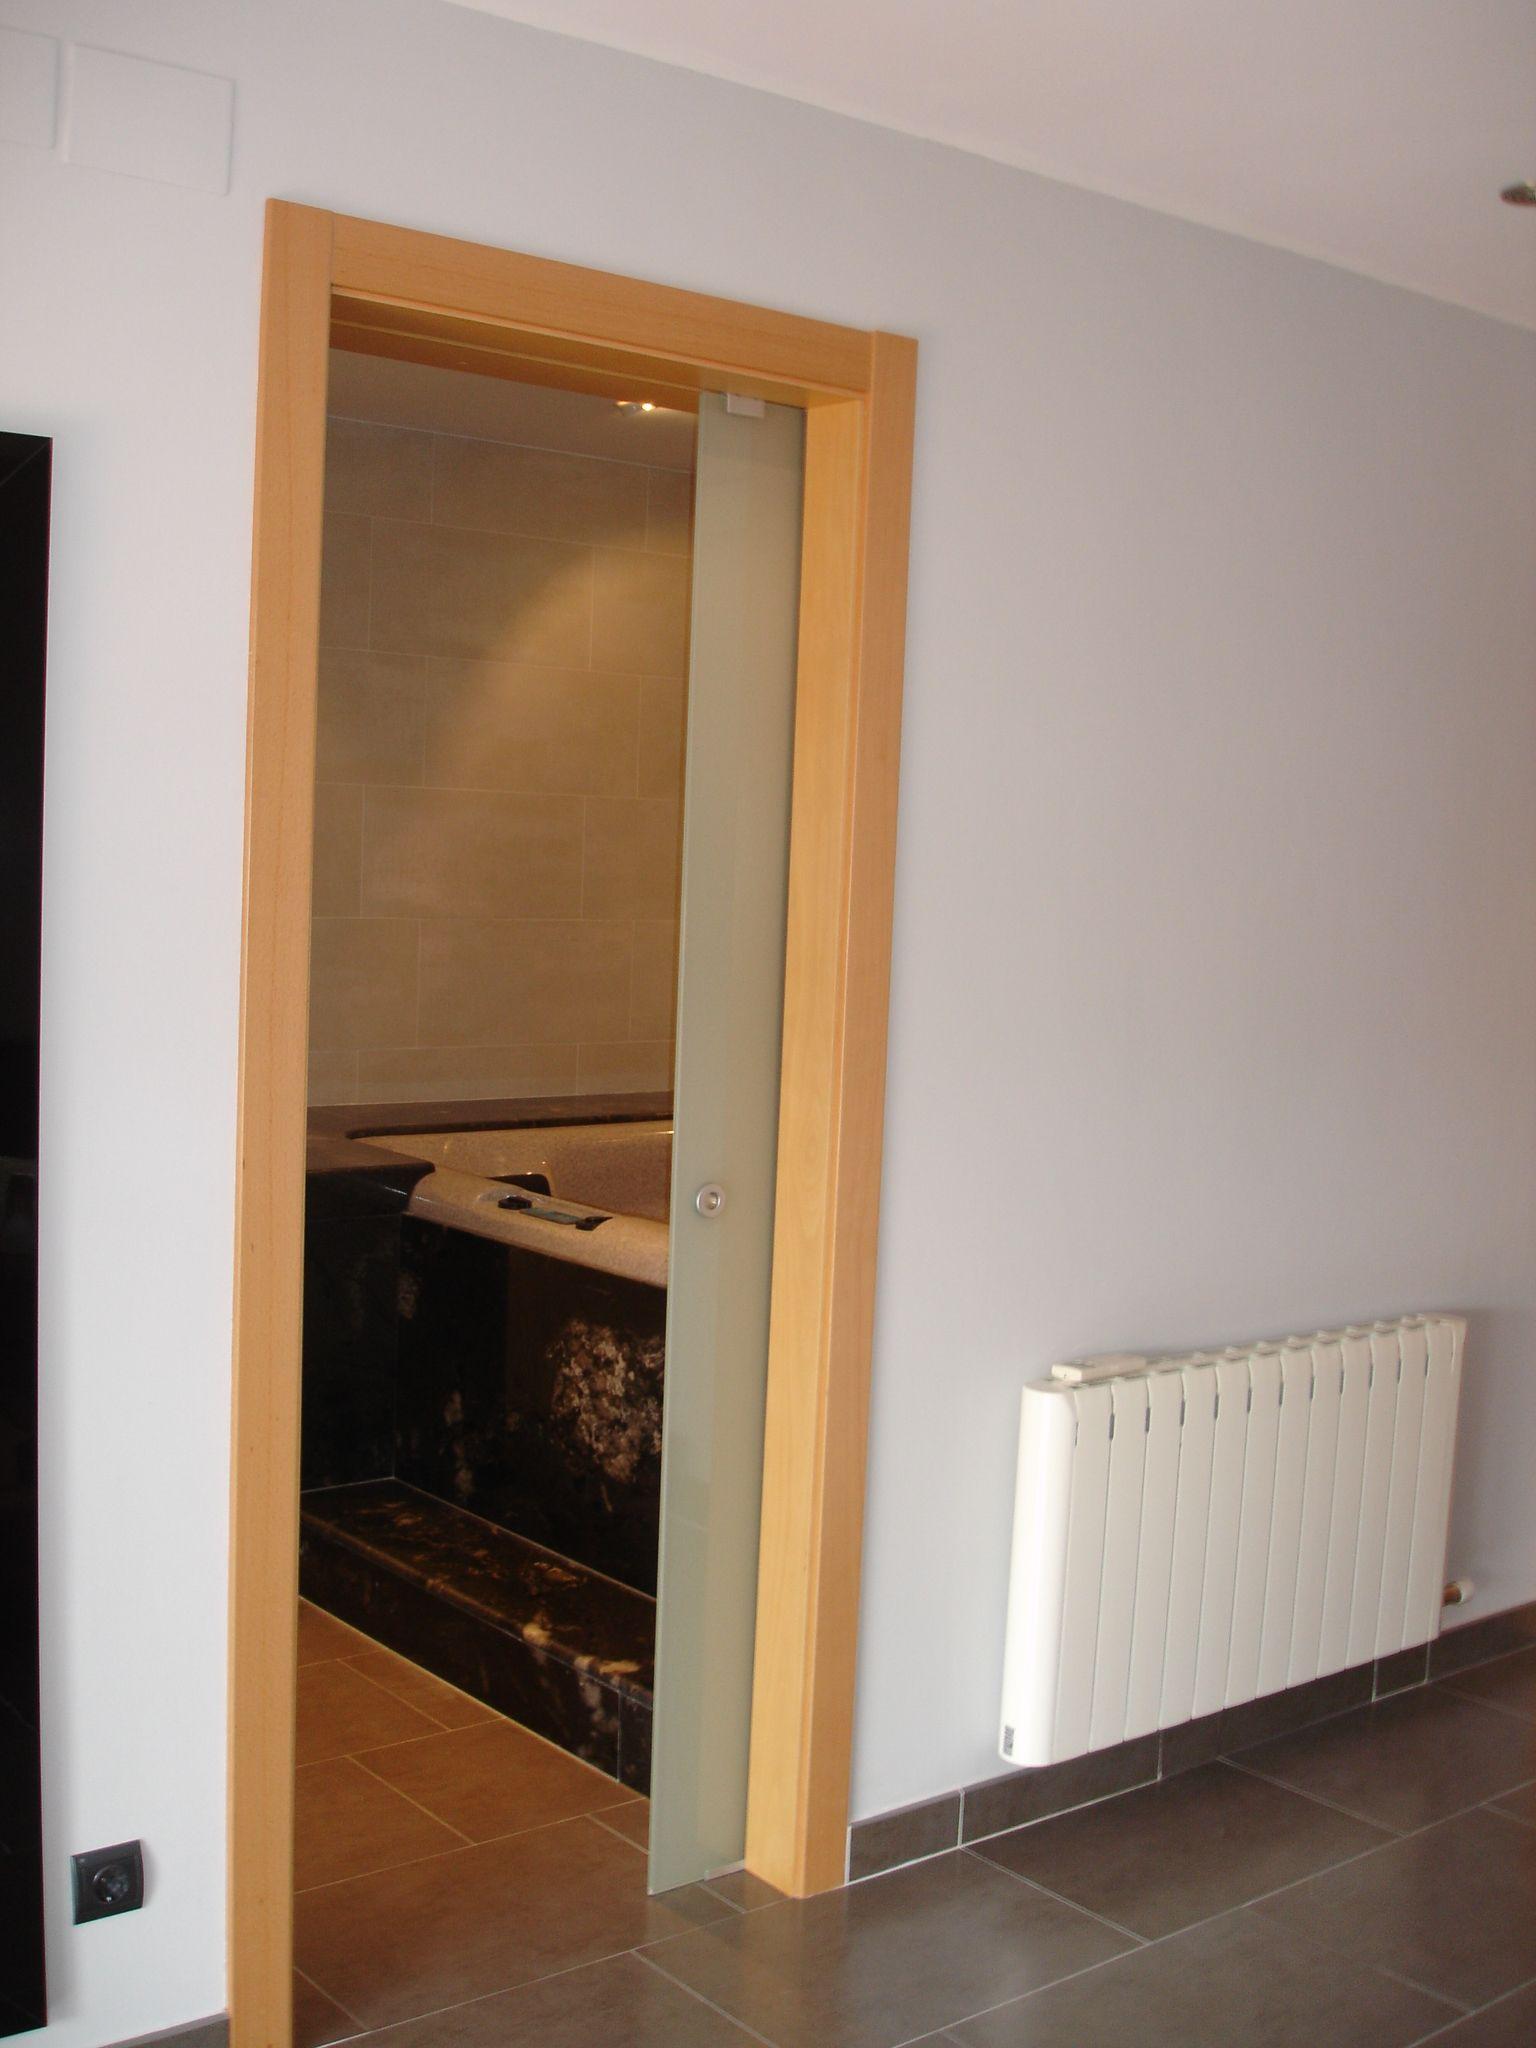 Puerta corredera de vidrio para ba o ideas para ba os pinterest ideas para - Puertas correderas de cristal para banos ...